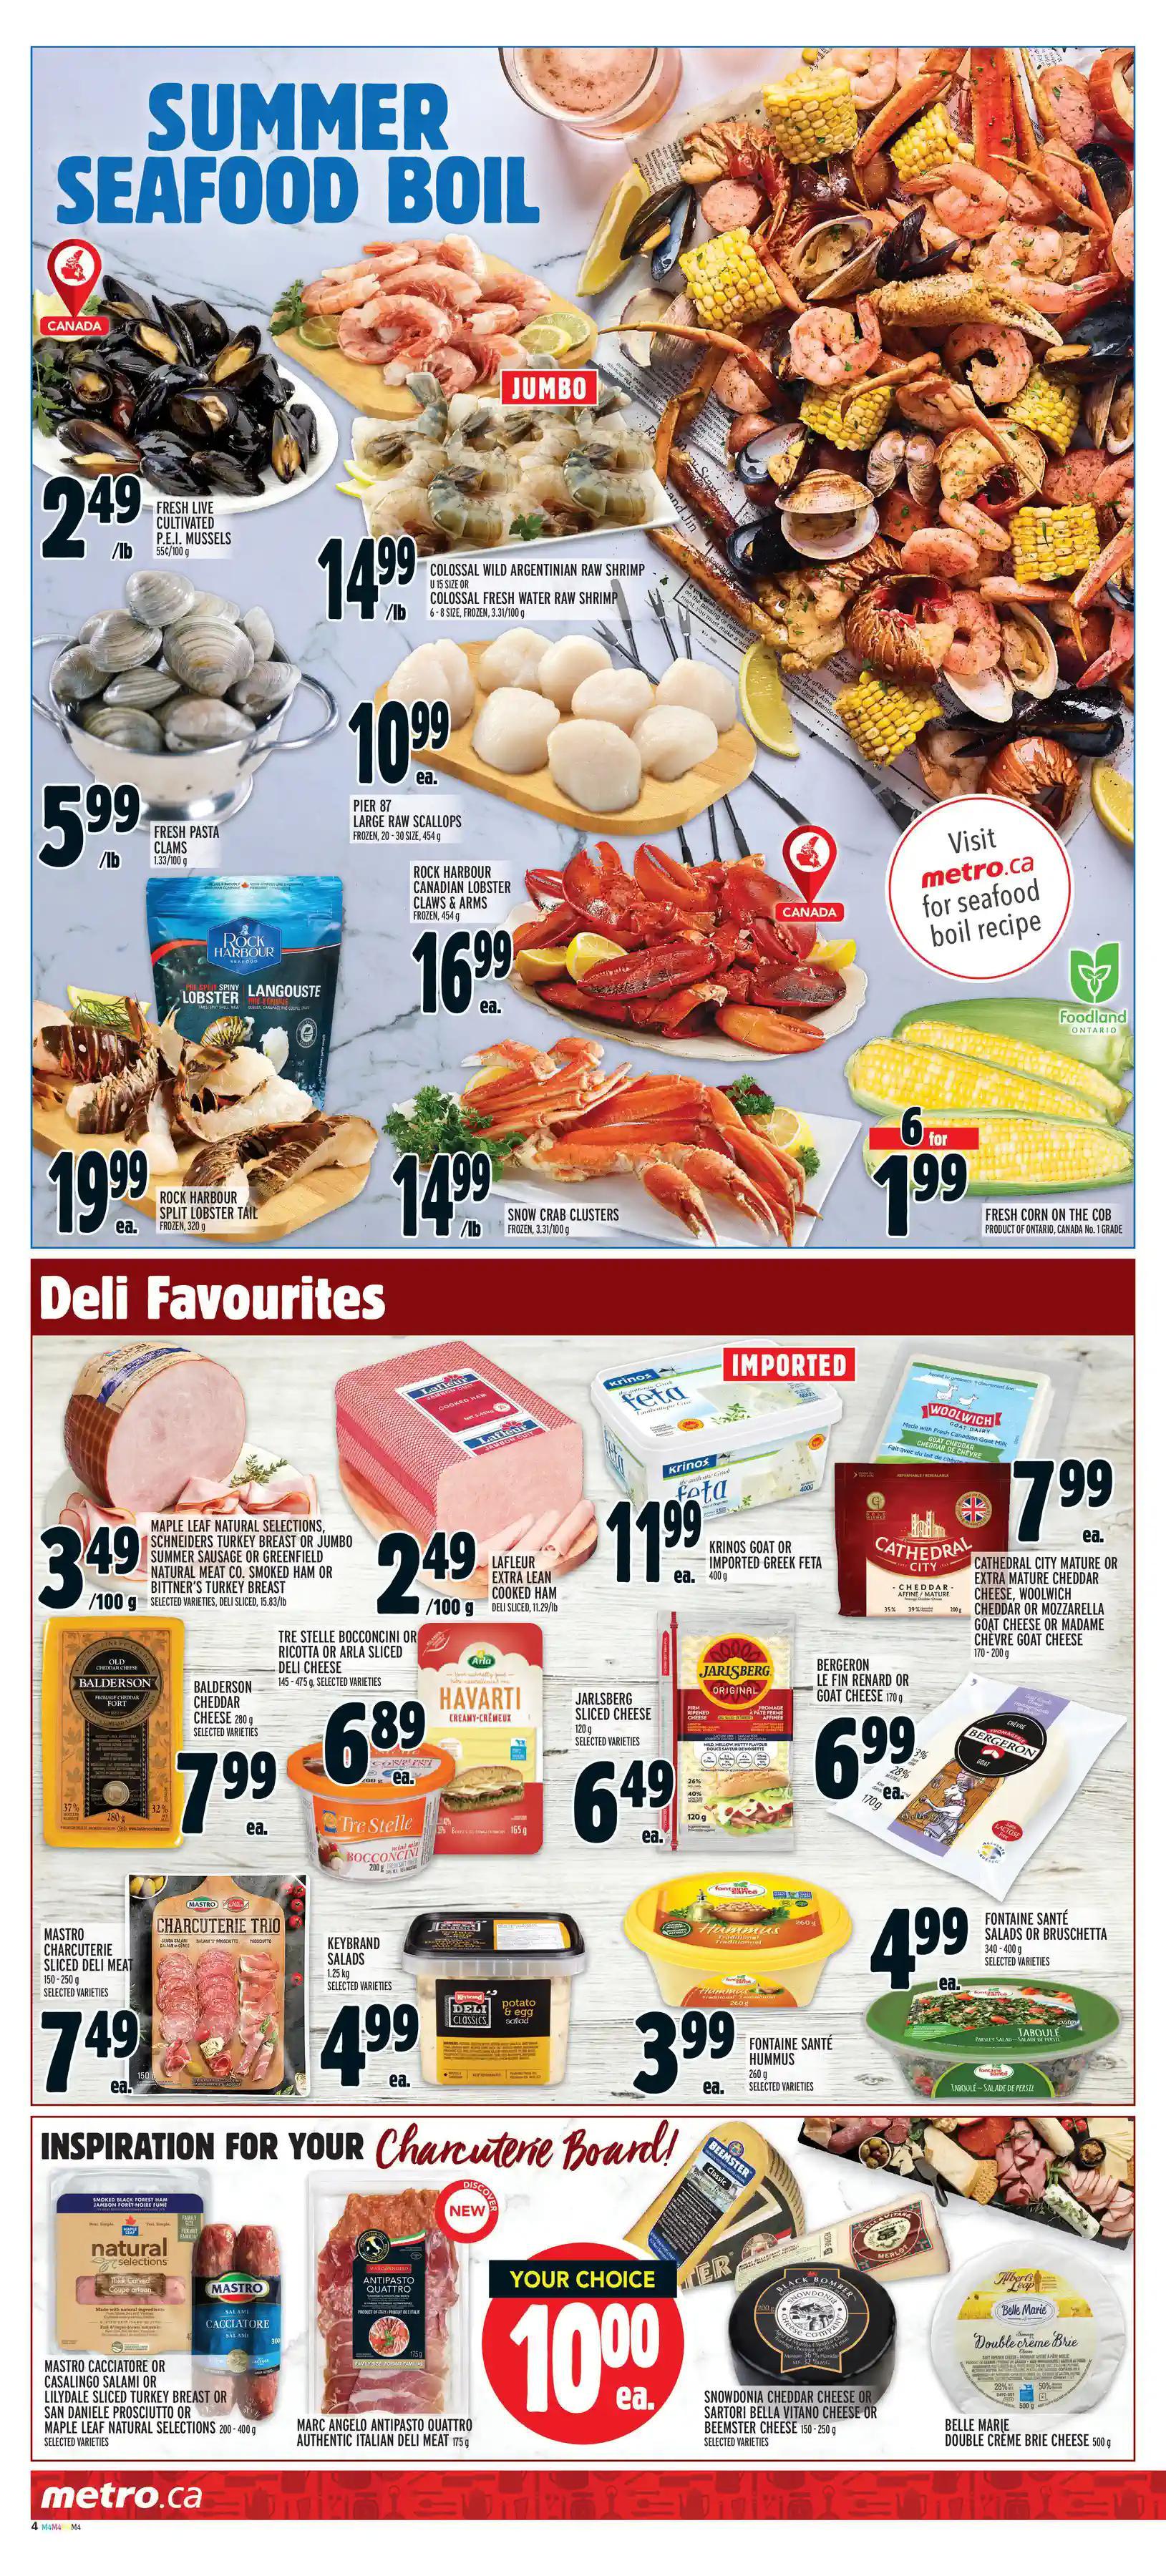 Metro - Weekly Flyer Specials - Page 7